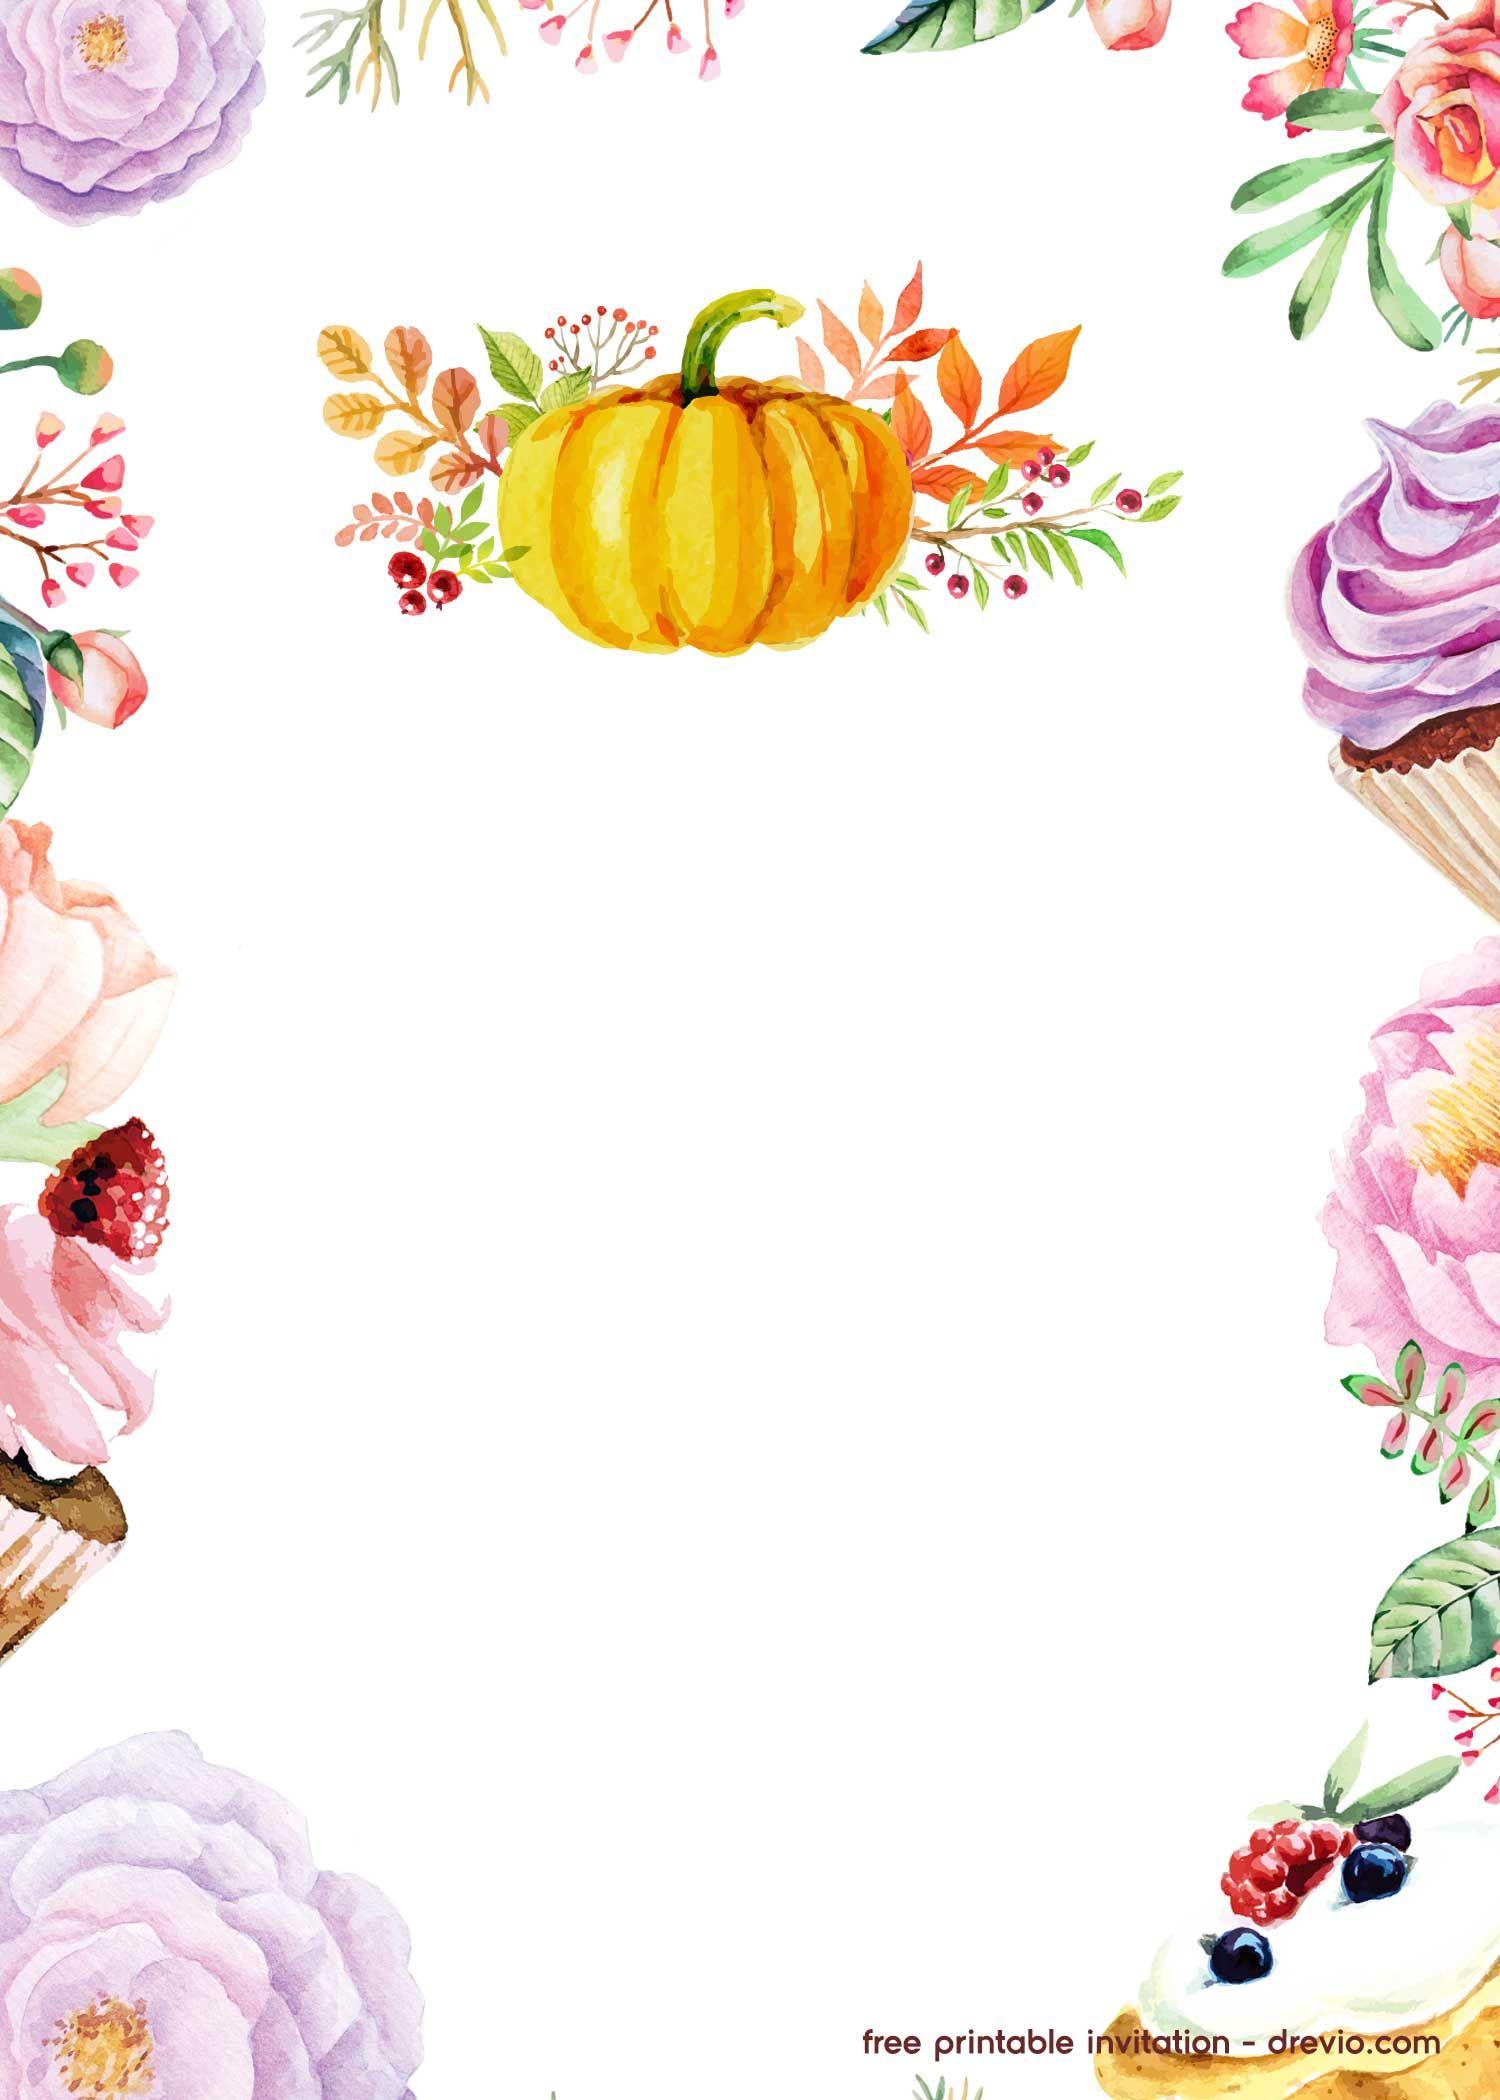 Free Printable Pumpkin Invitation Template